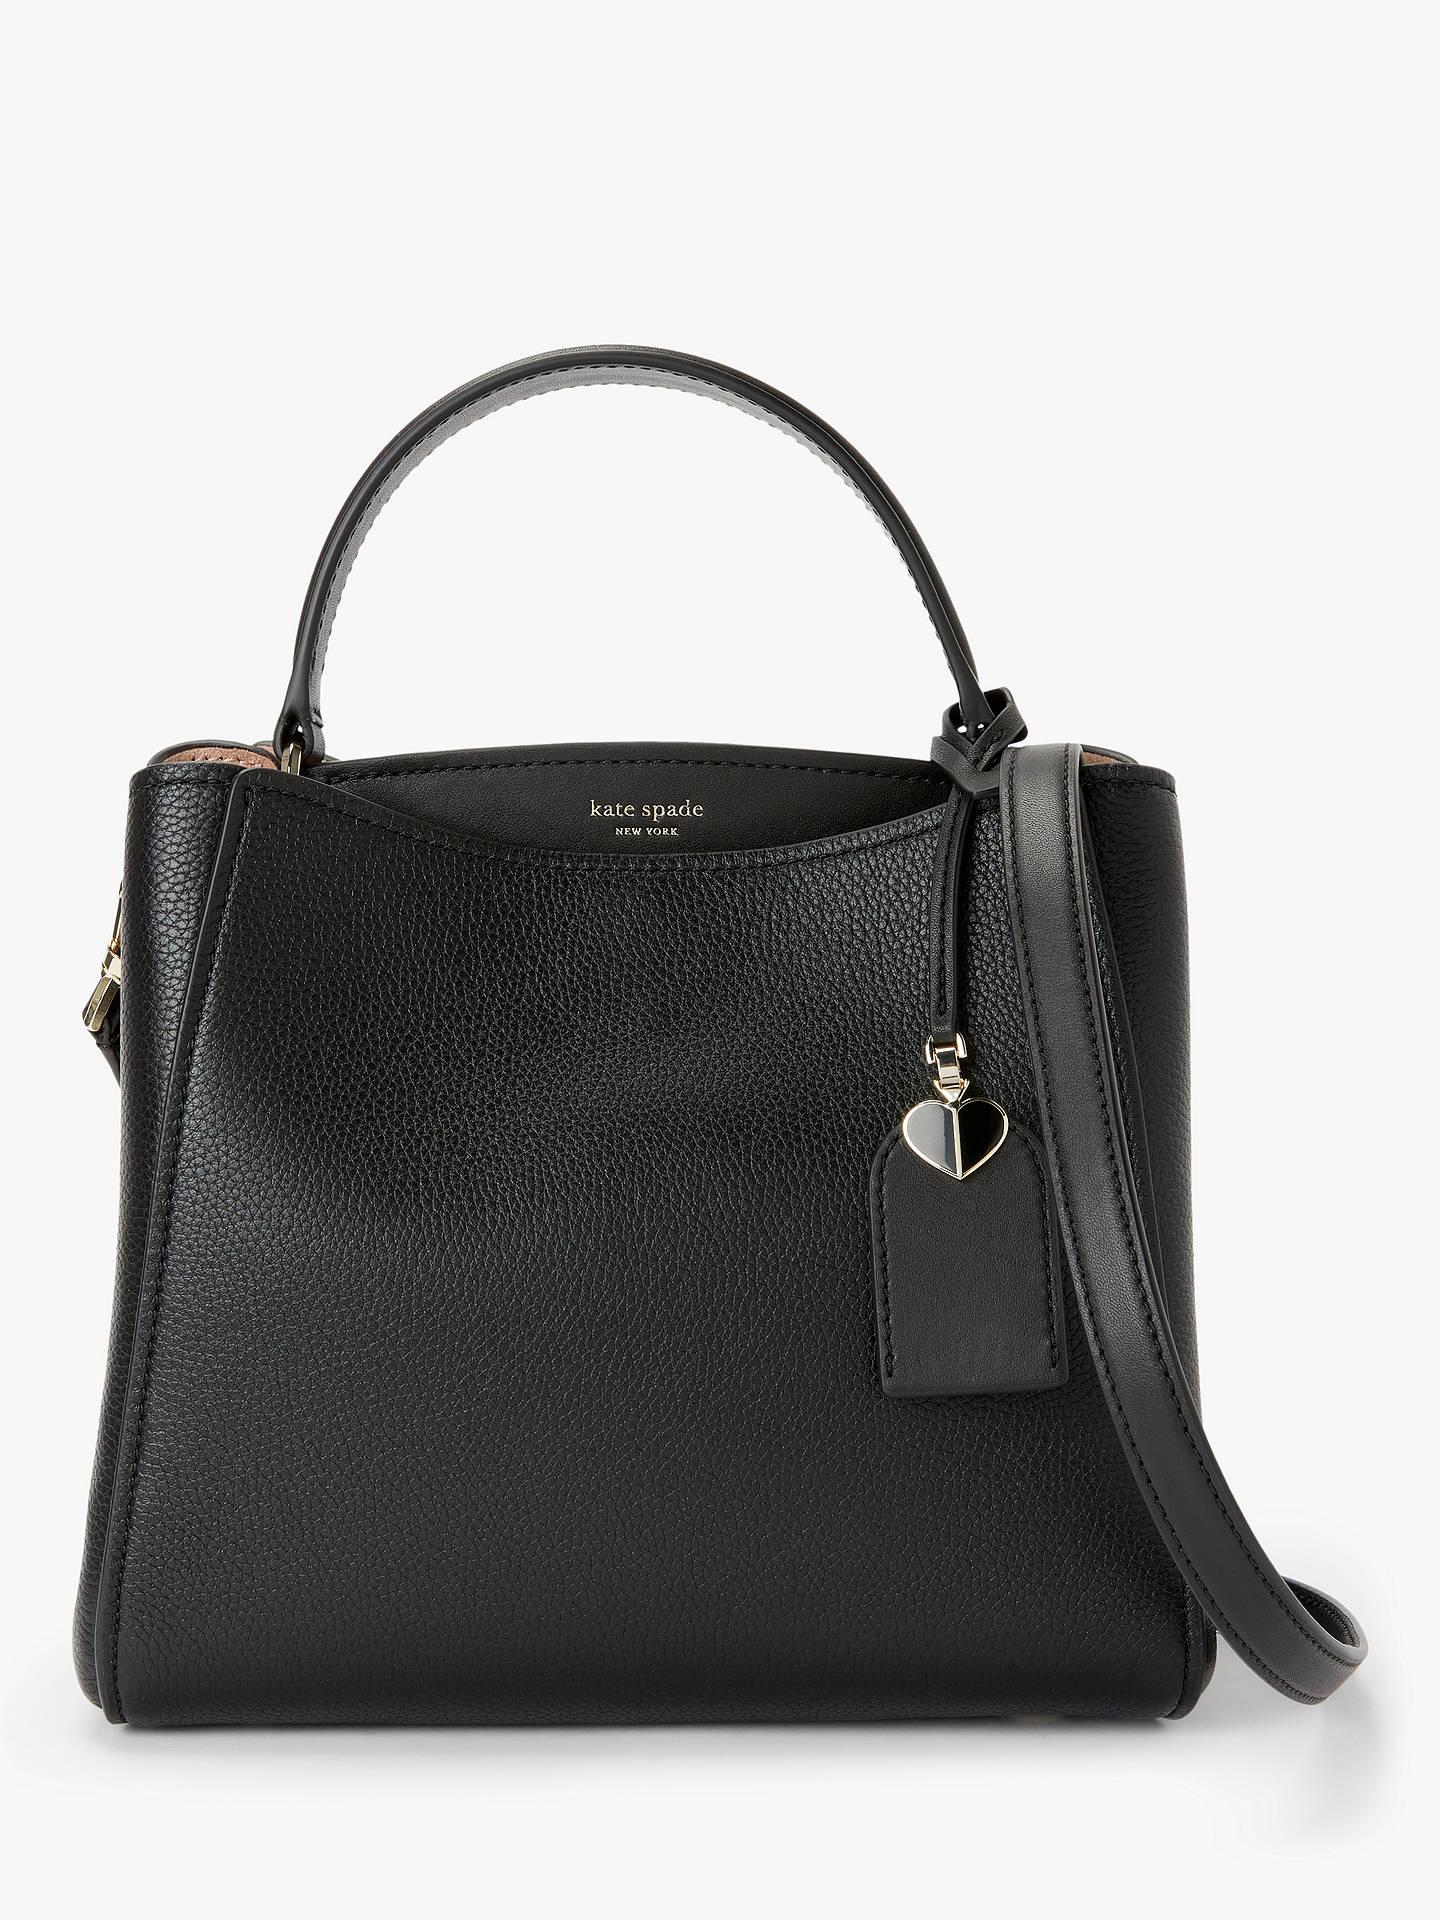 1b276b98 kate spade new york Fleur Leather Small Satchel Bag, Black